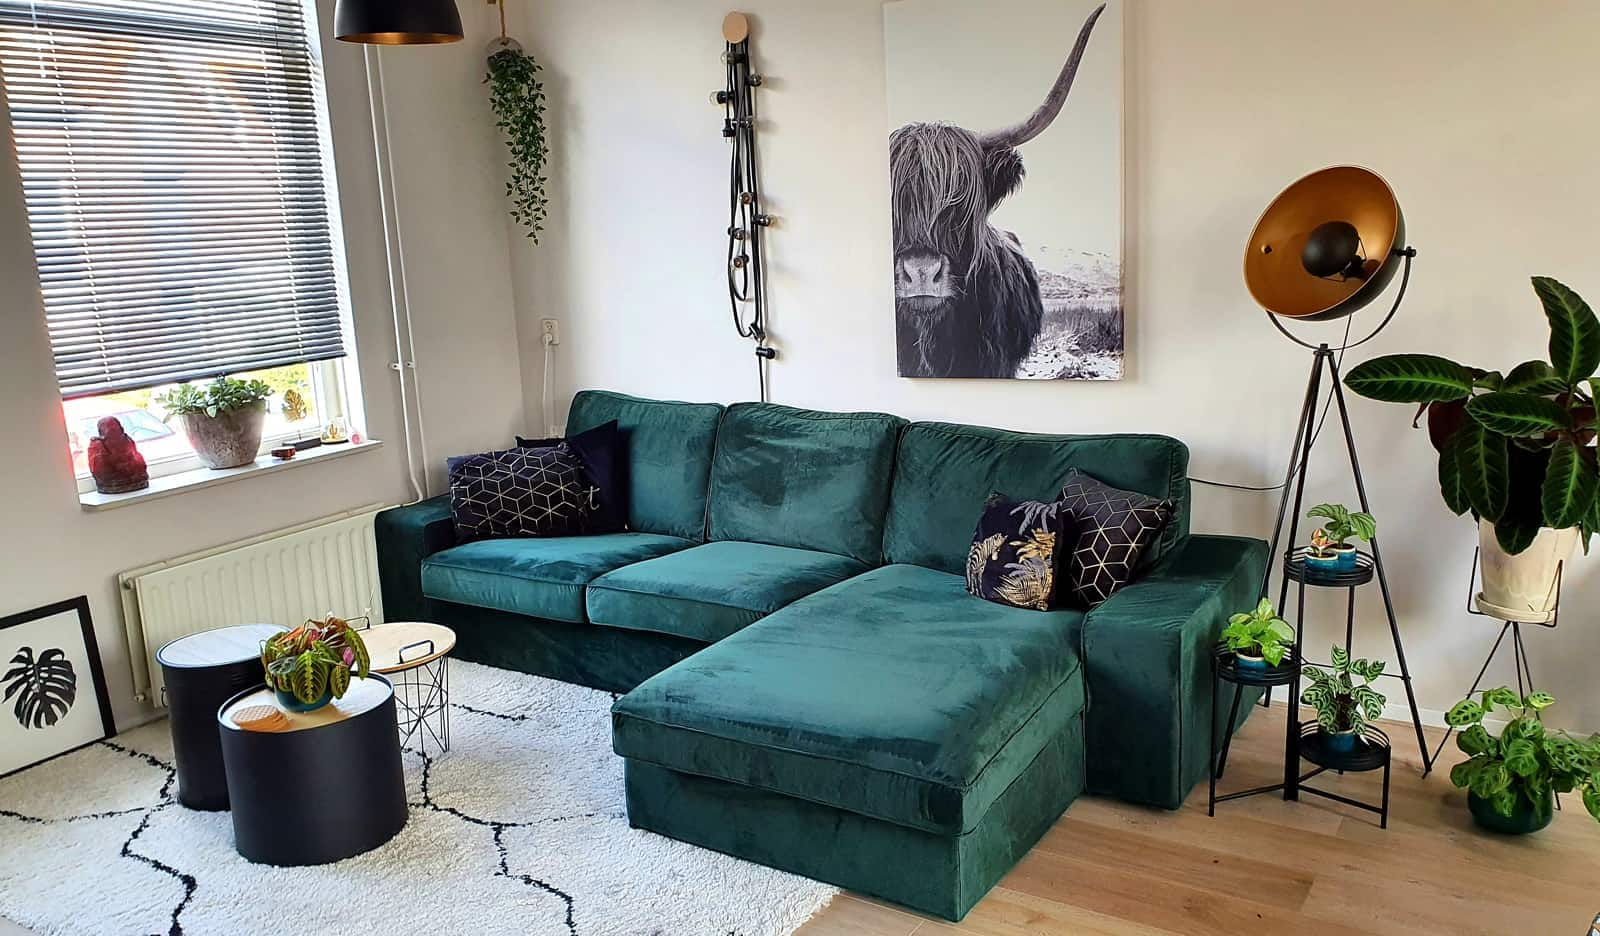 IKEA bankhoezen | NORSEMAISON | Kivik 2 zits met chaise Fluweel